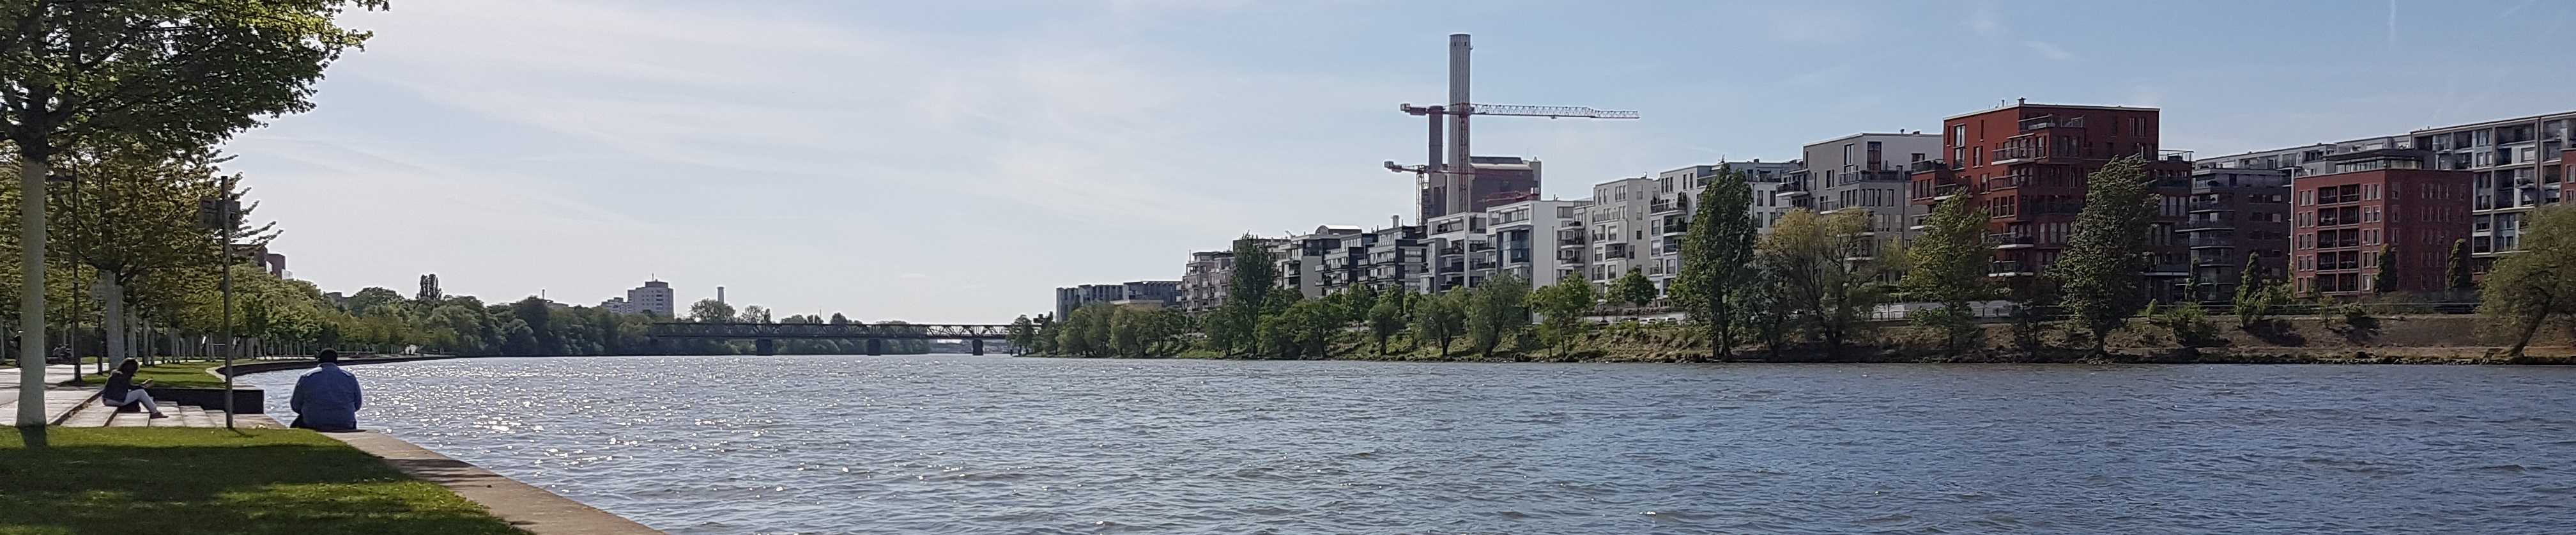 Mainufer Frankfurt - Slider